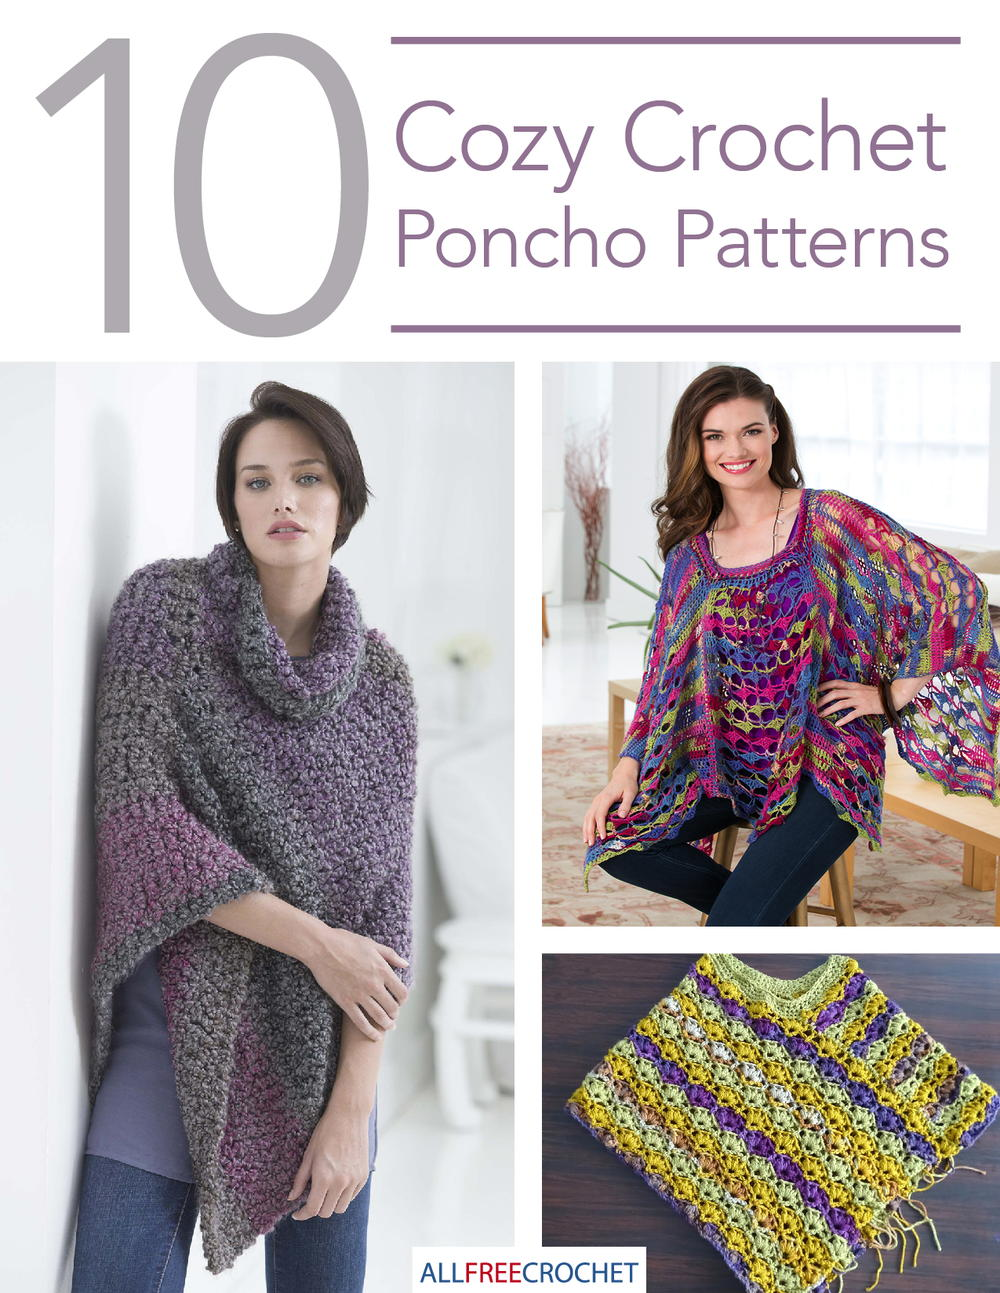 free crochet poncho patterns 10 cozy crochet poncho patterns IQJLAVY